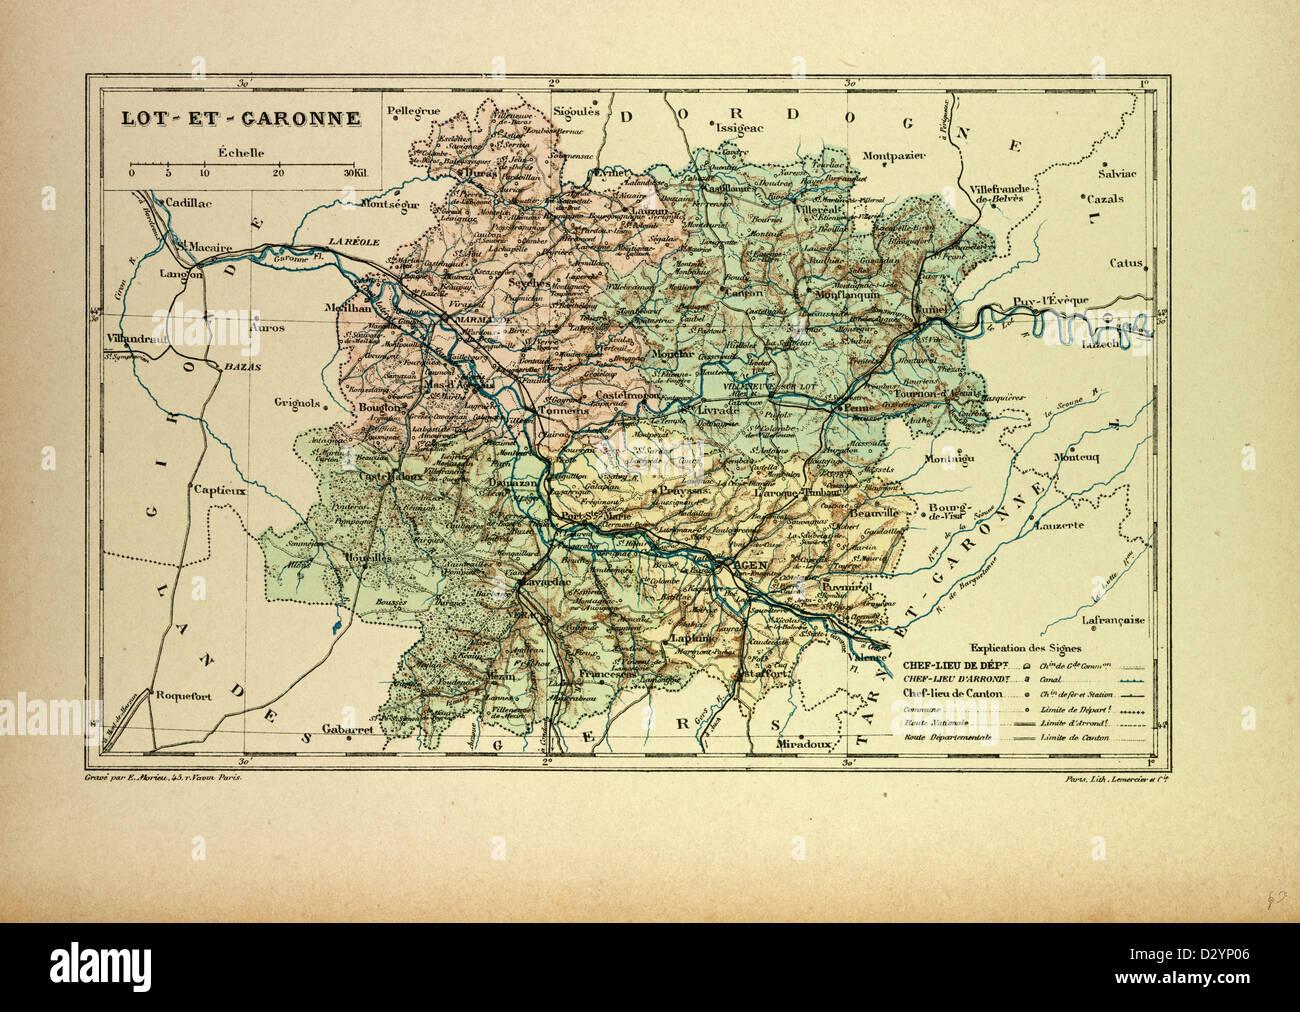 Map Of Lot France.Map Of Lot Et Garonne France Stock Photo 53470374 Alamy